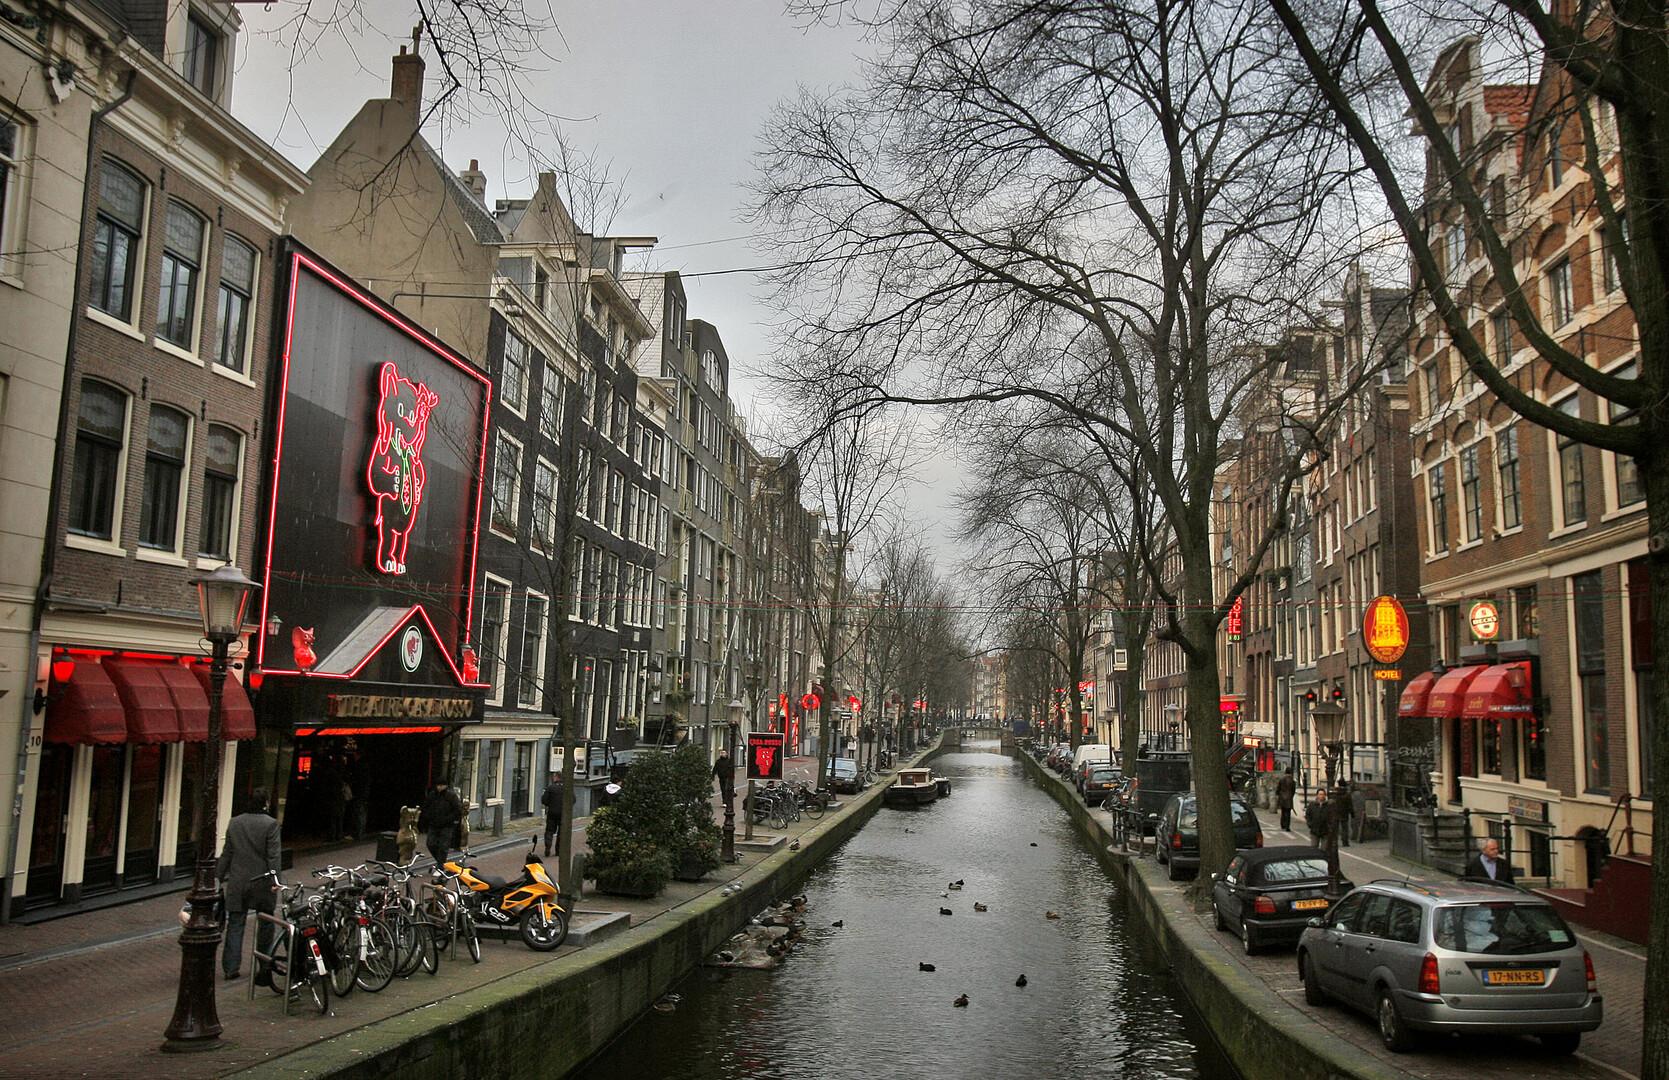 هولندا تنوي تغيير اسمها!